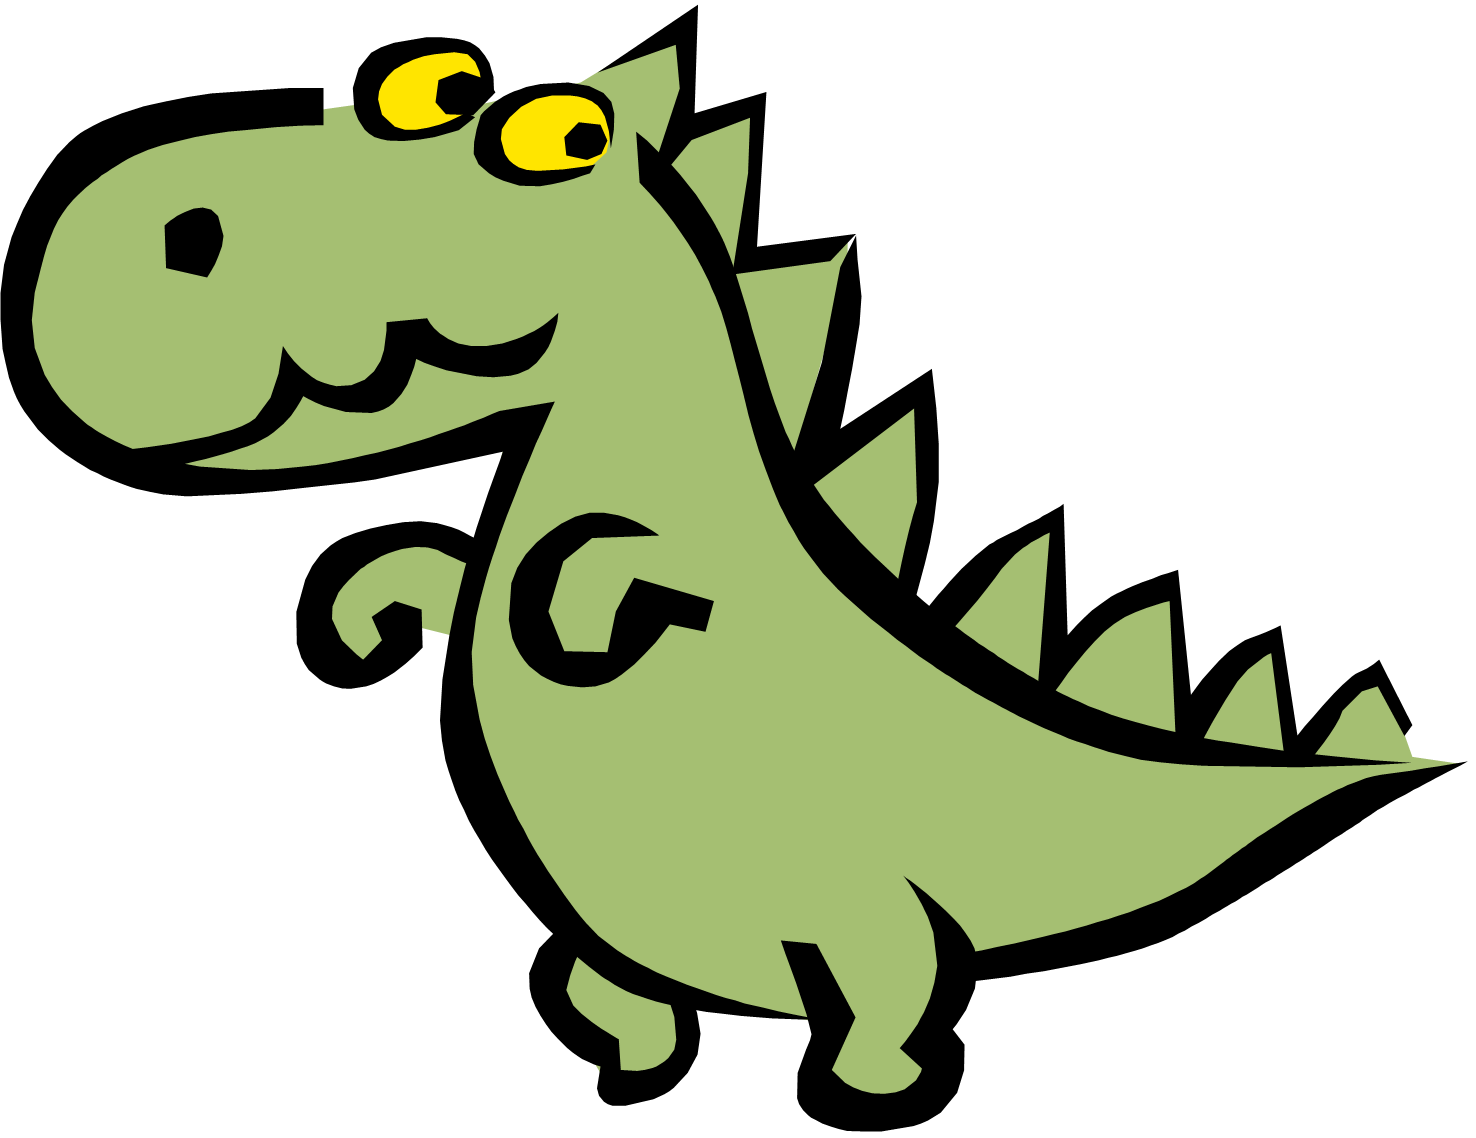 Dino Quest - Dinosaur Dig Game v1.5.7 (Mod) Immagini